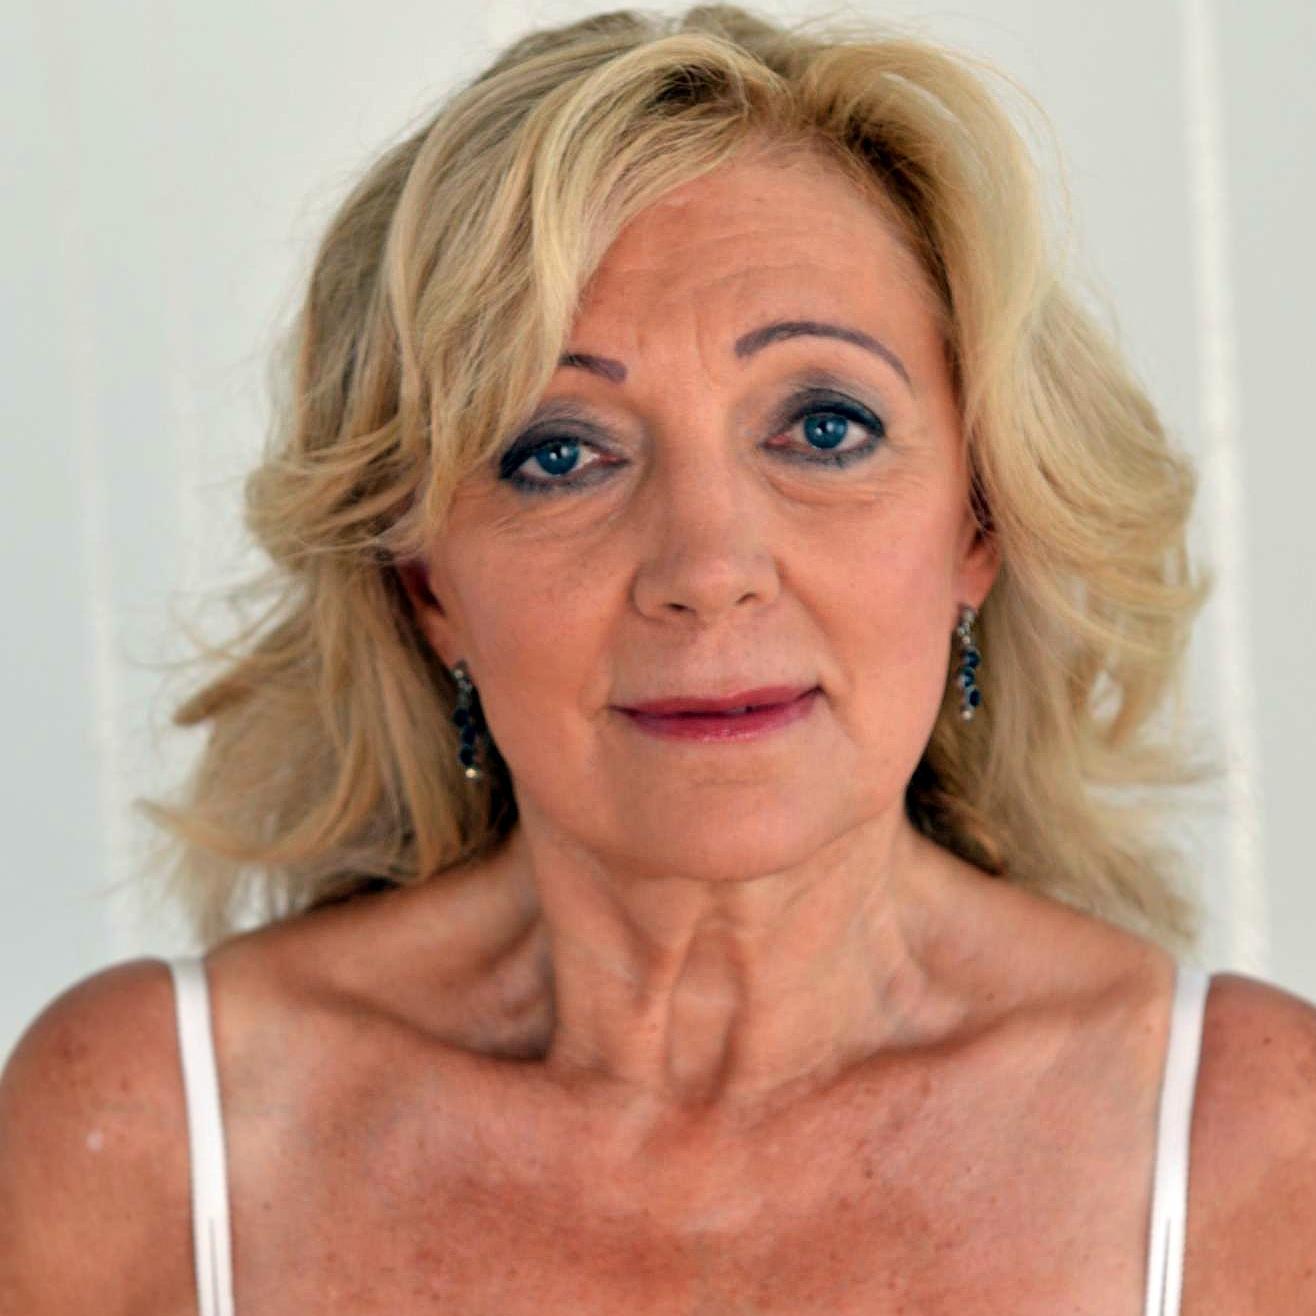 Women over 50 wanting sex